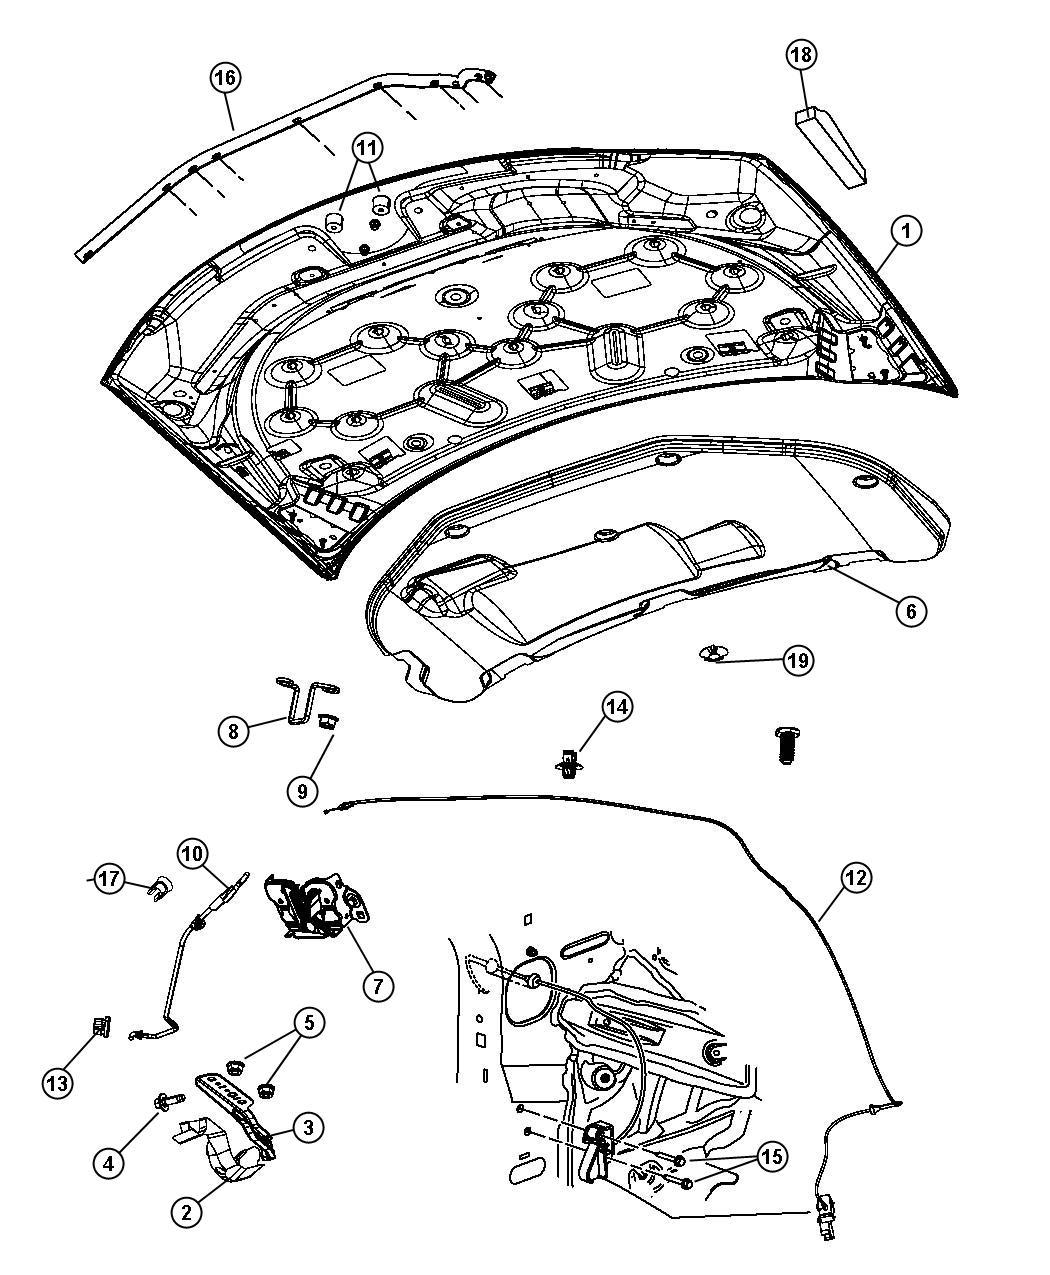 2009 Chrysler Sebring Hood Interior Glass Body 05008923ak Mopar Parts Inc Myrtle Beach Sc